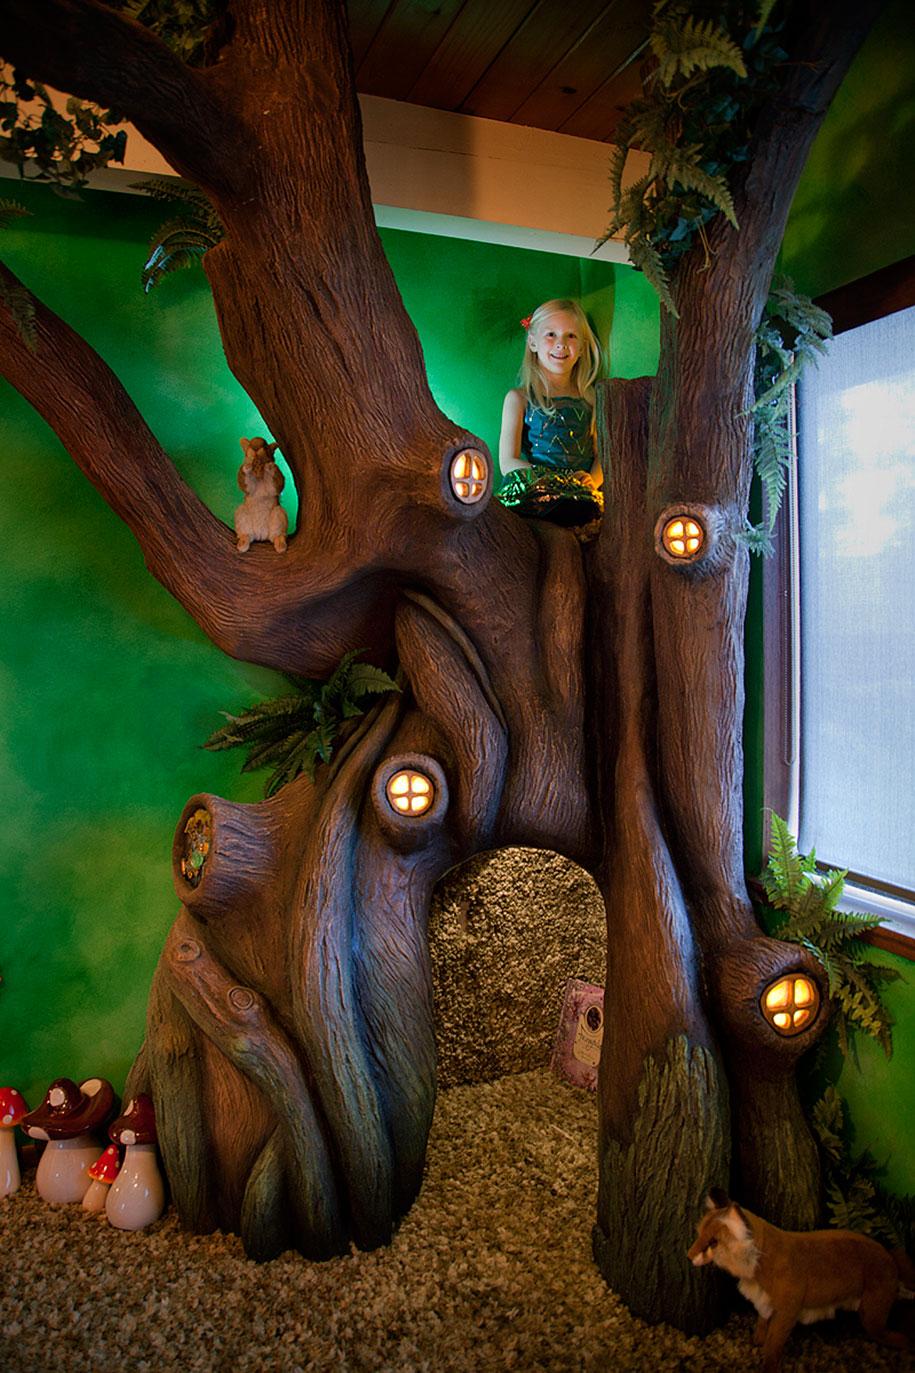 dad-build-daughter-fairytale-bedroom-radamshome-8